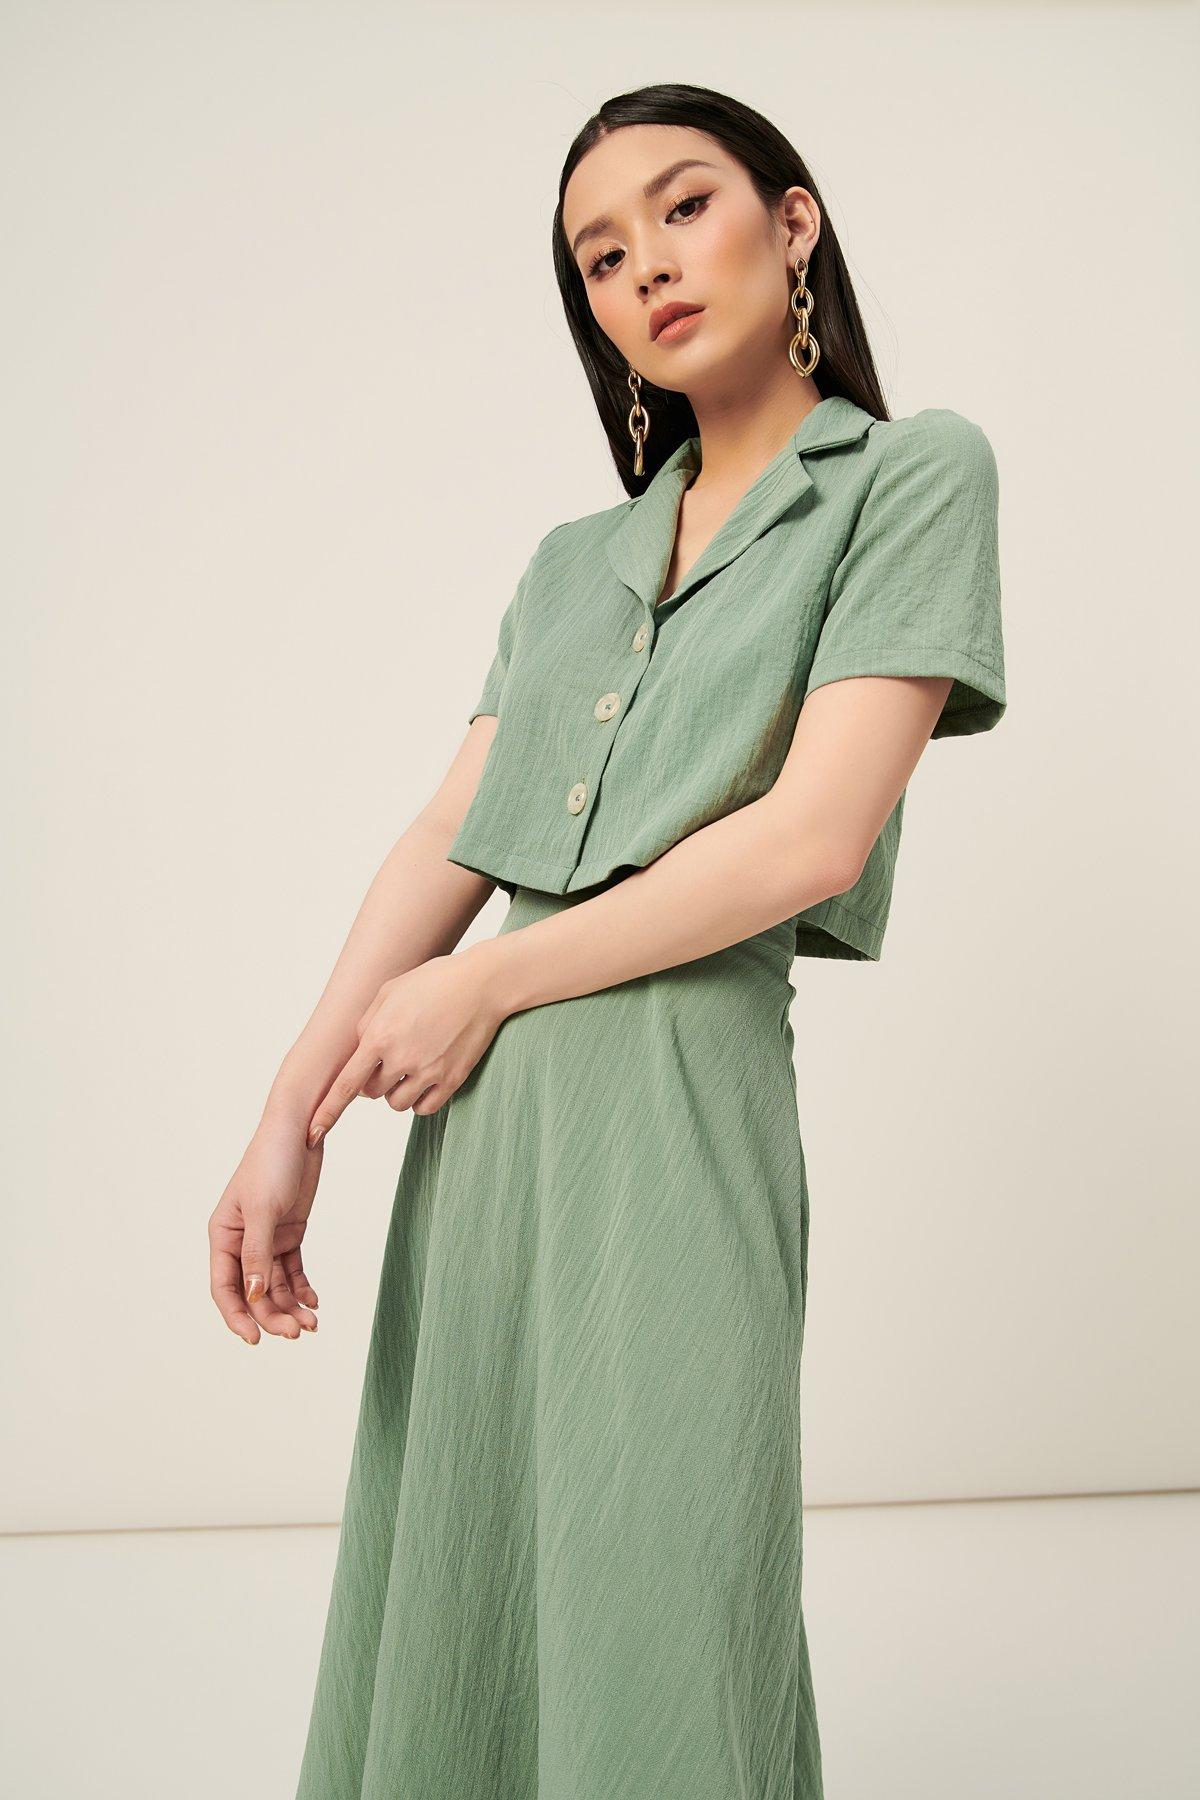 Bộ linen cổ danton - Fern Olive Two-piece outfit